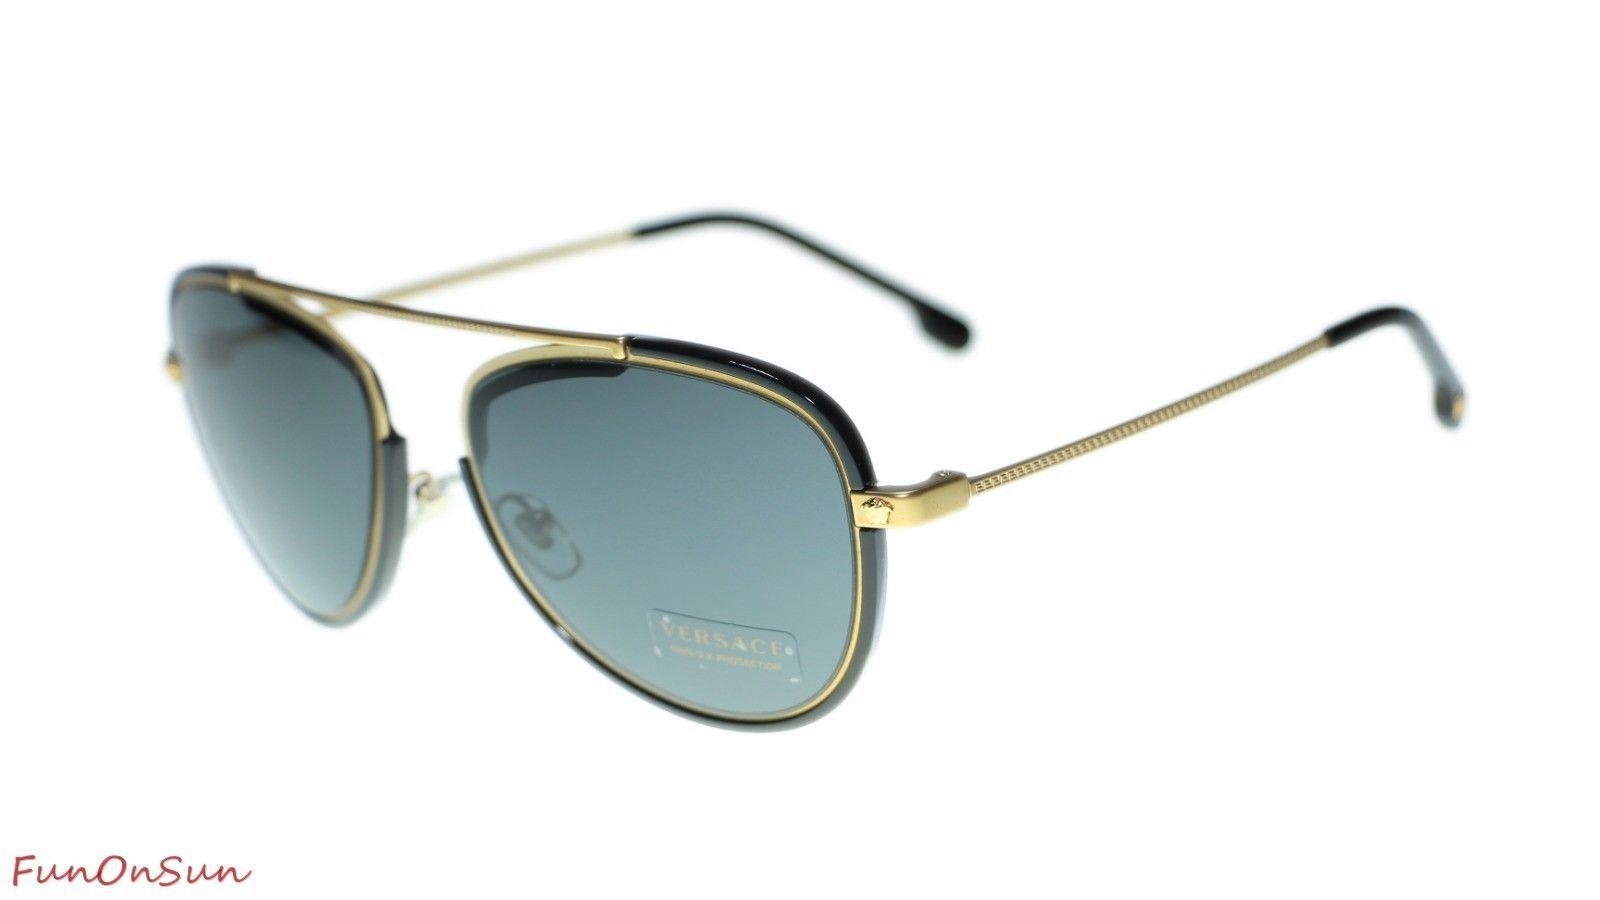 4bce4a1b7434 Versace Men Pilot Sunglasses VE2193 142887 and 23 similar items. 10